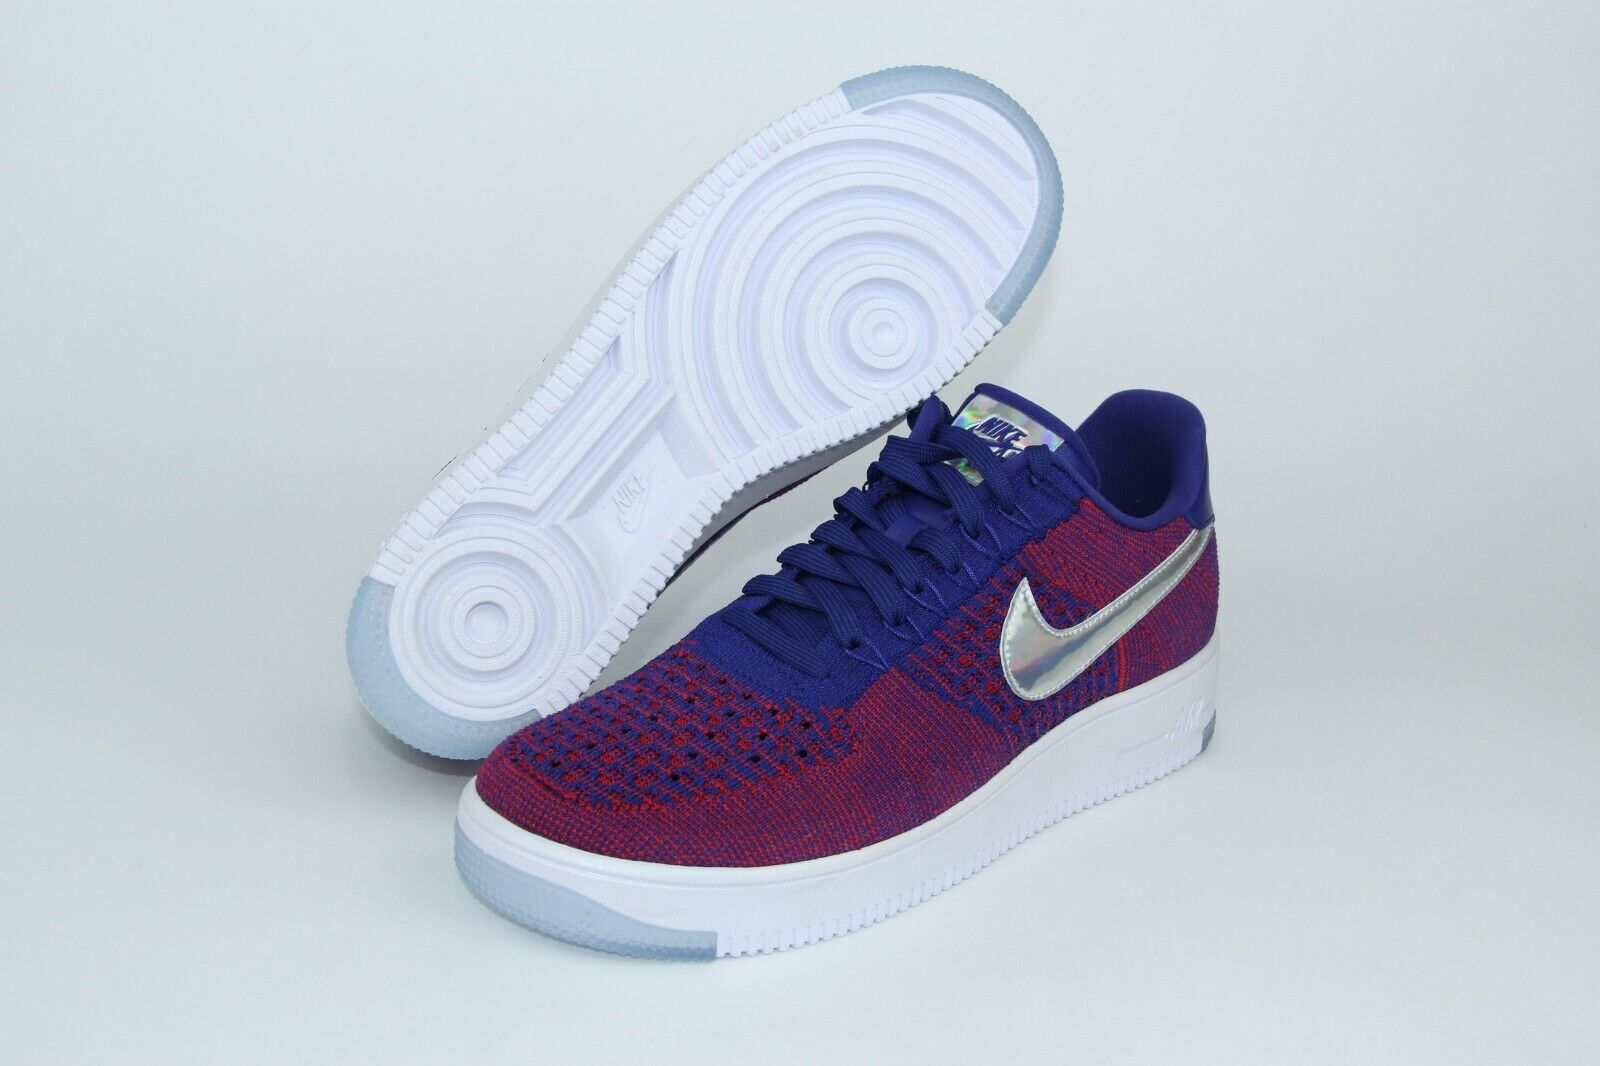 Nike Air Max 1 Ultra 2.0 Flyknit 875942 400 SIZE 11 USA 10 UK 45 EU NEW DS   eBay